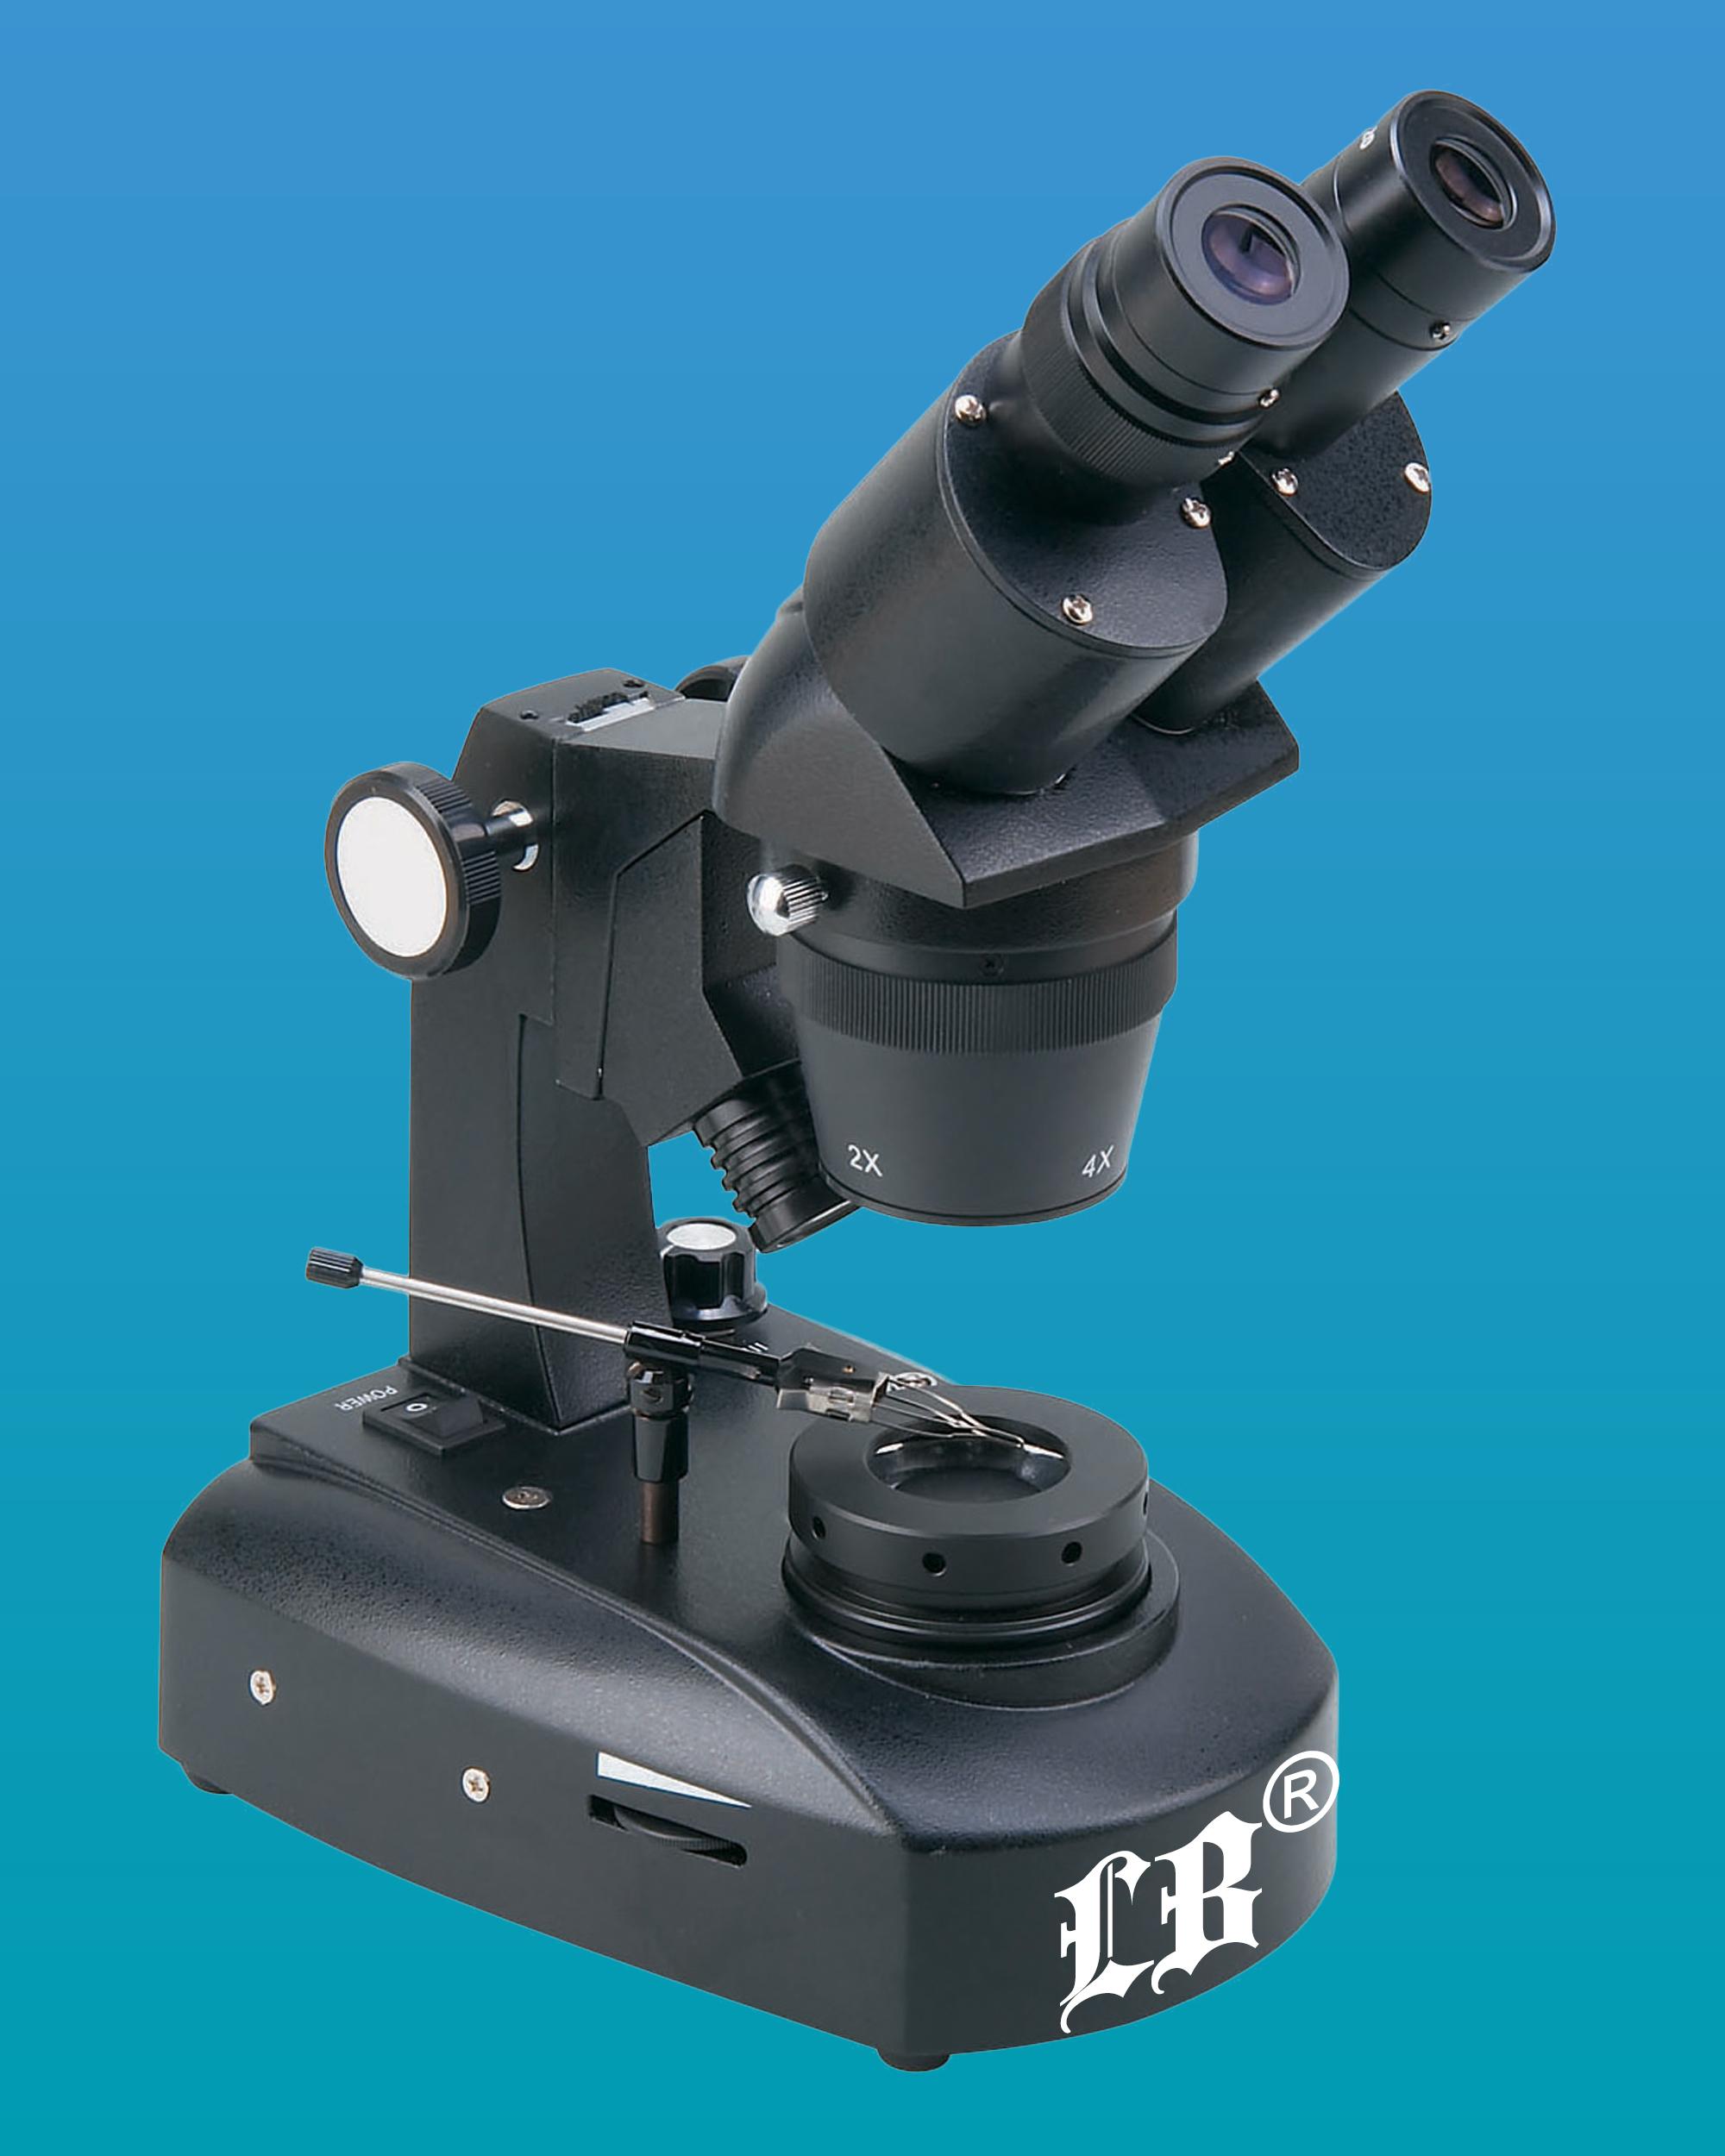 [LB-862] Binocular Gemological Microscope w/ Wide Field, Incident & Transmitted Halogen Illumination